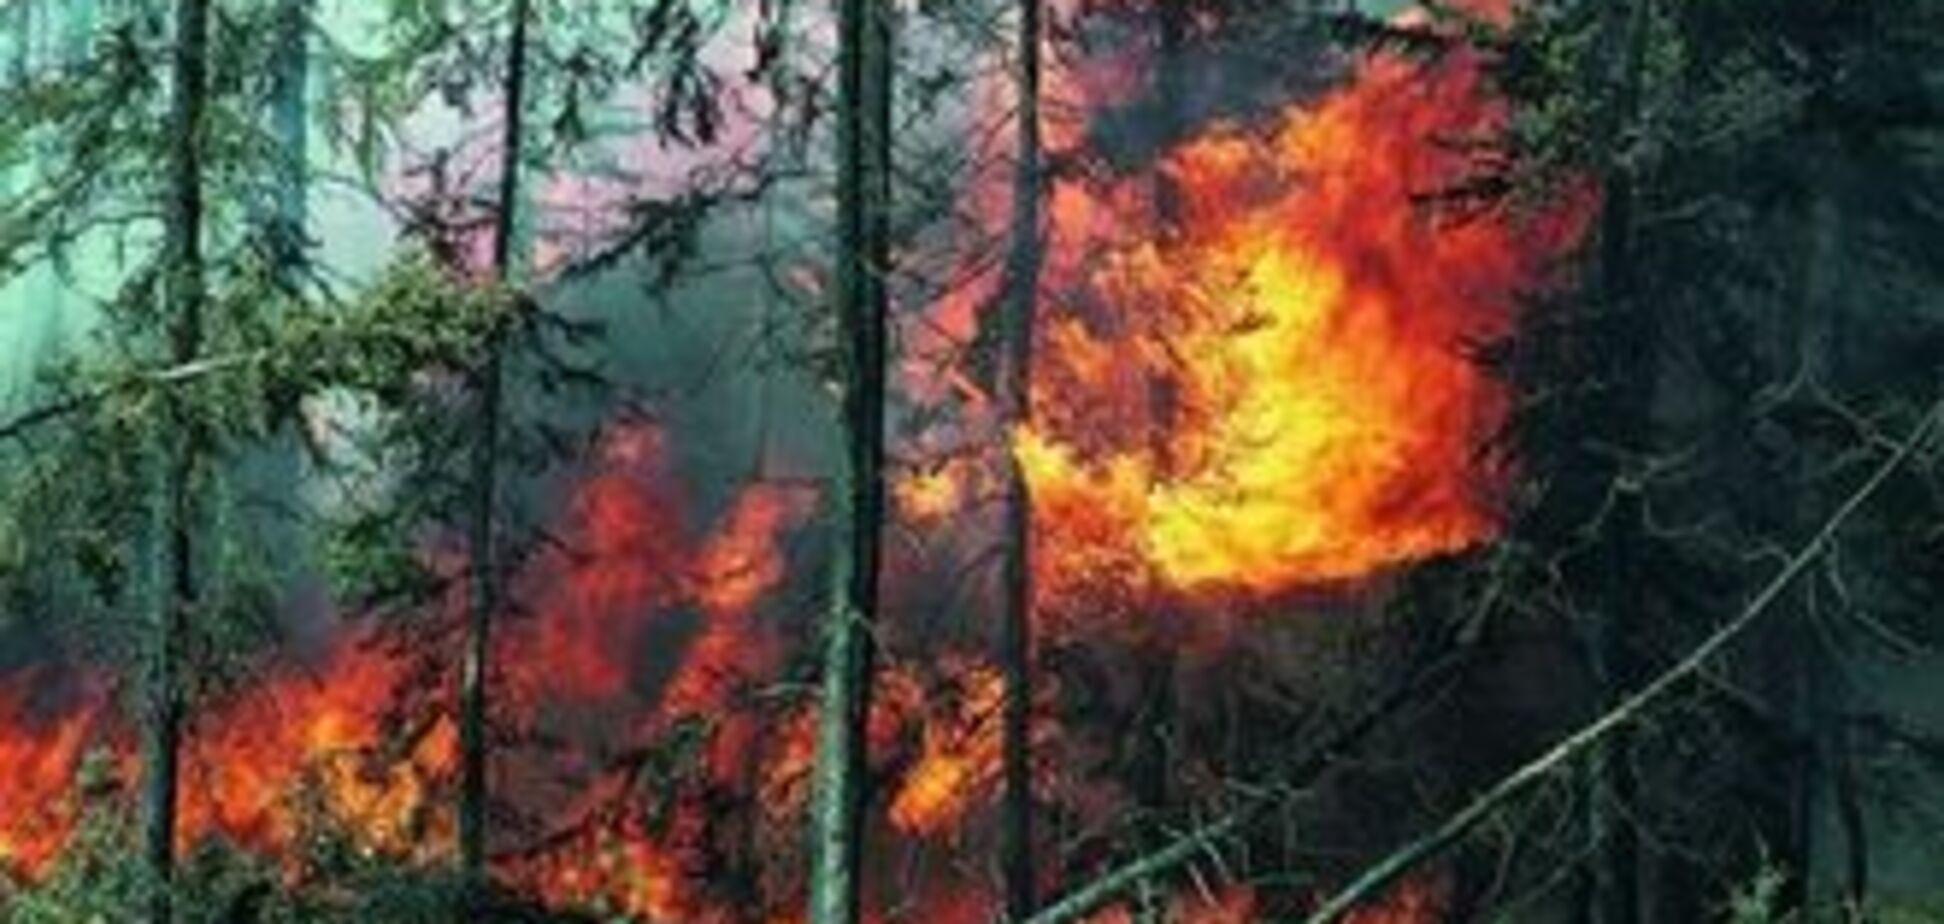 У МНС скаржаться на застарілу пожежну техніку